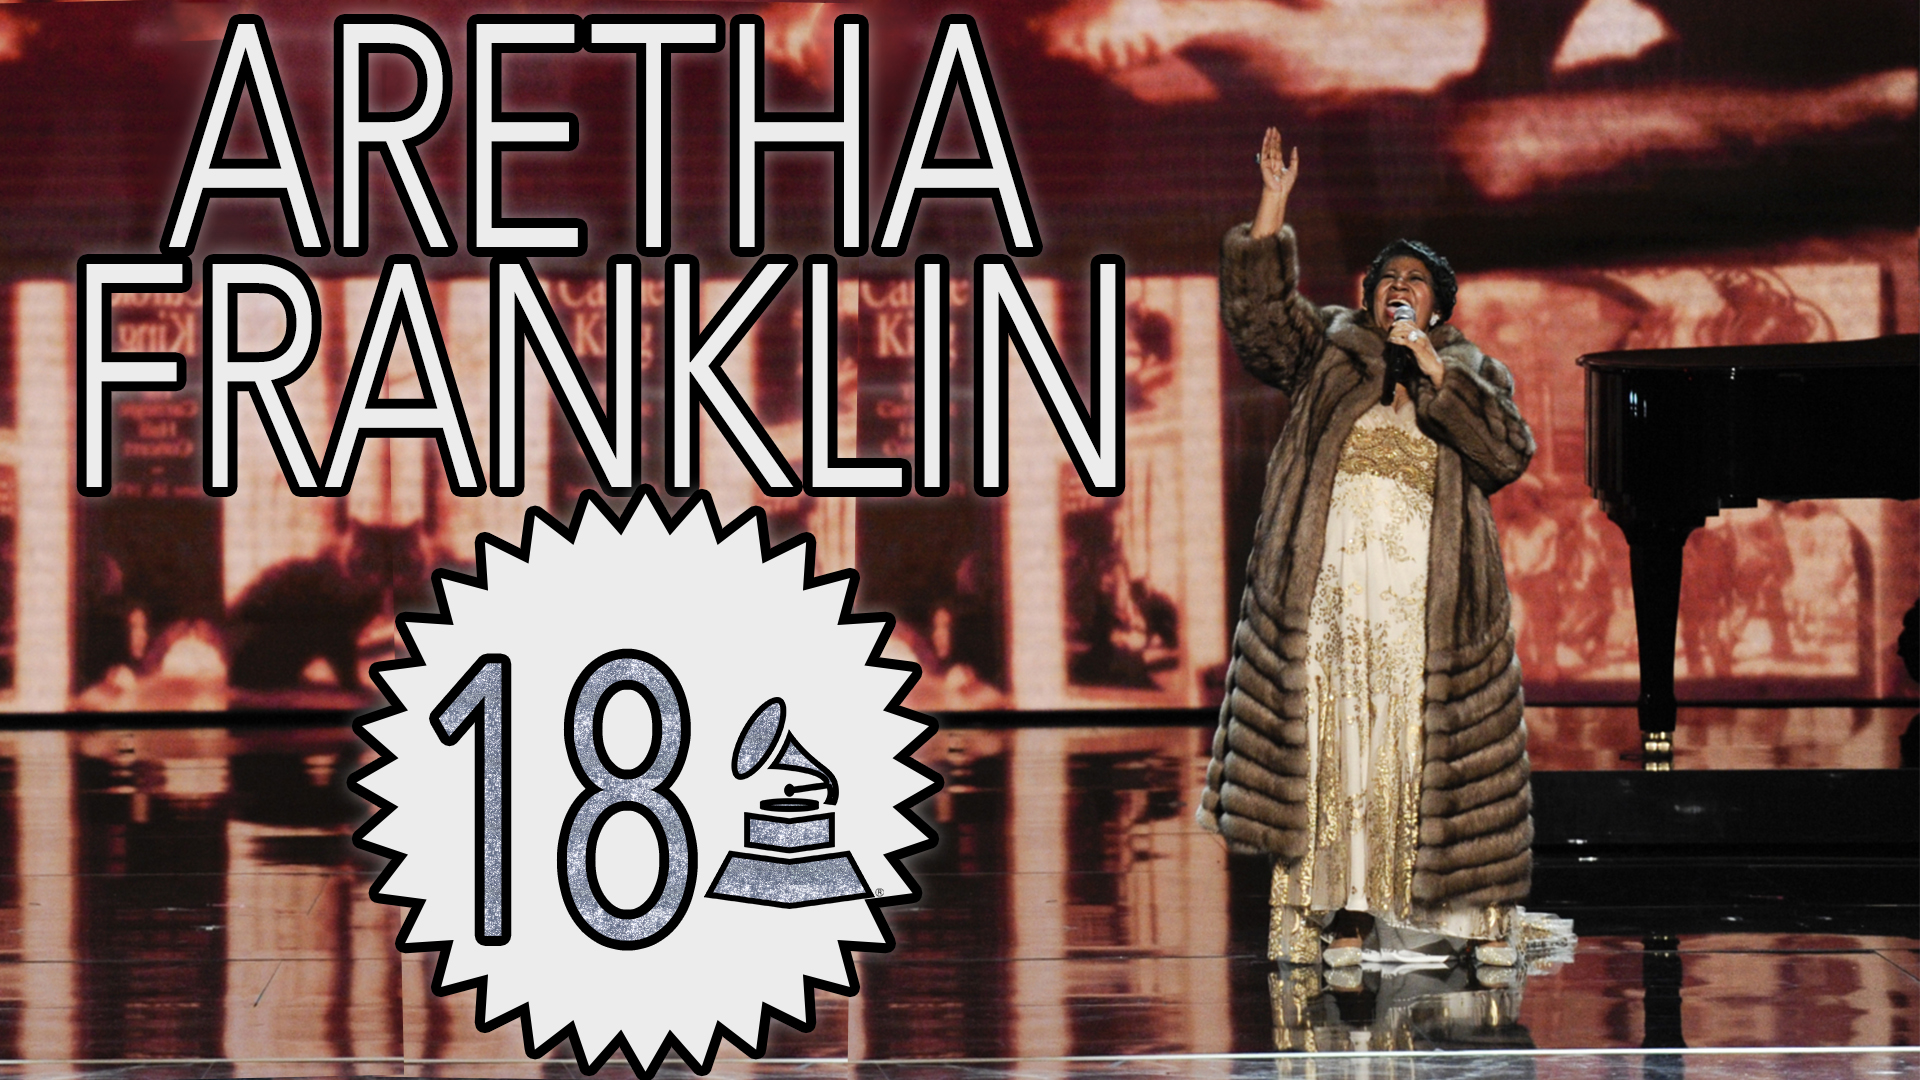 Aretha Franklin with 18 GRAMMY Awards